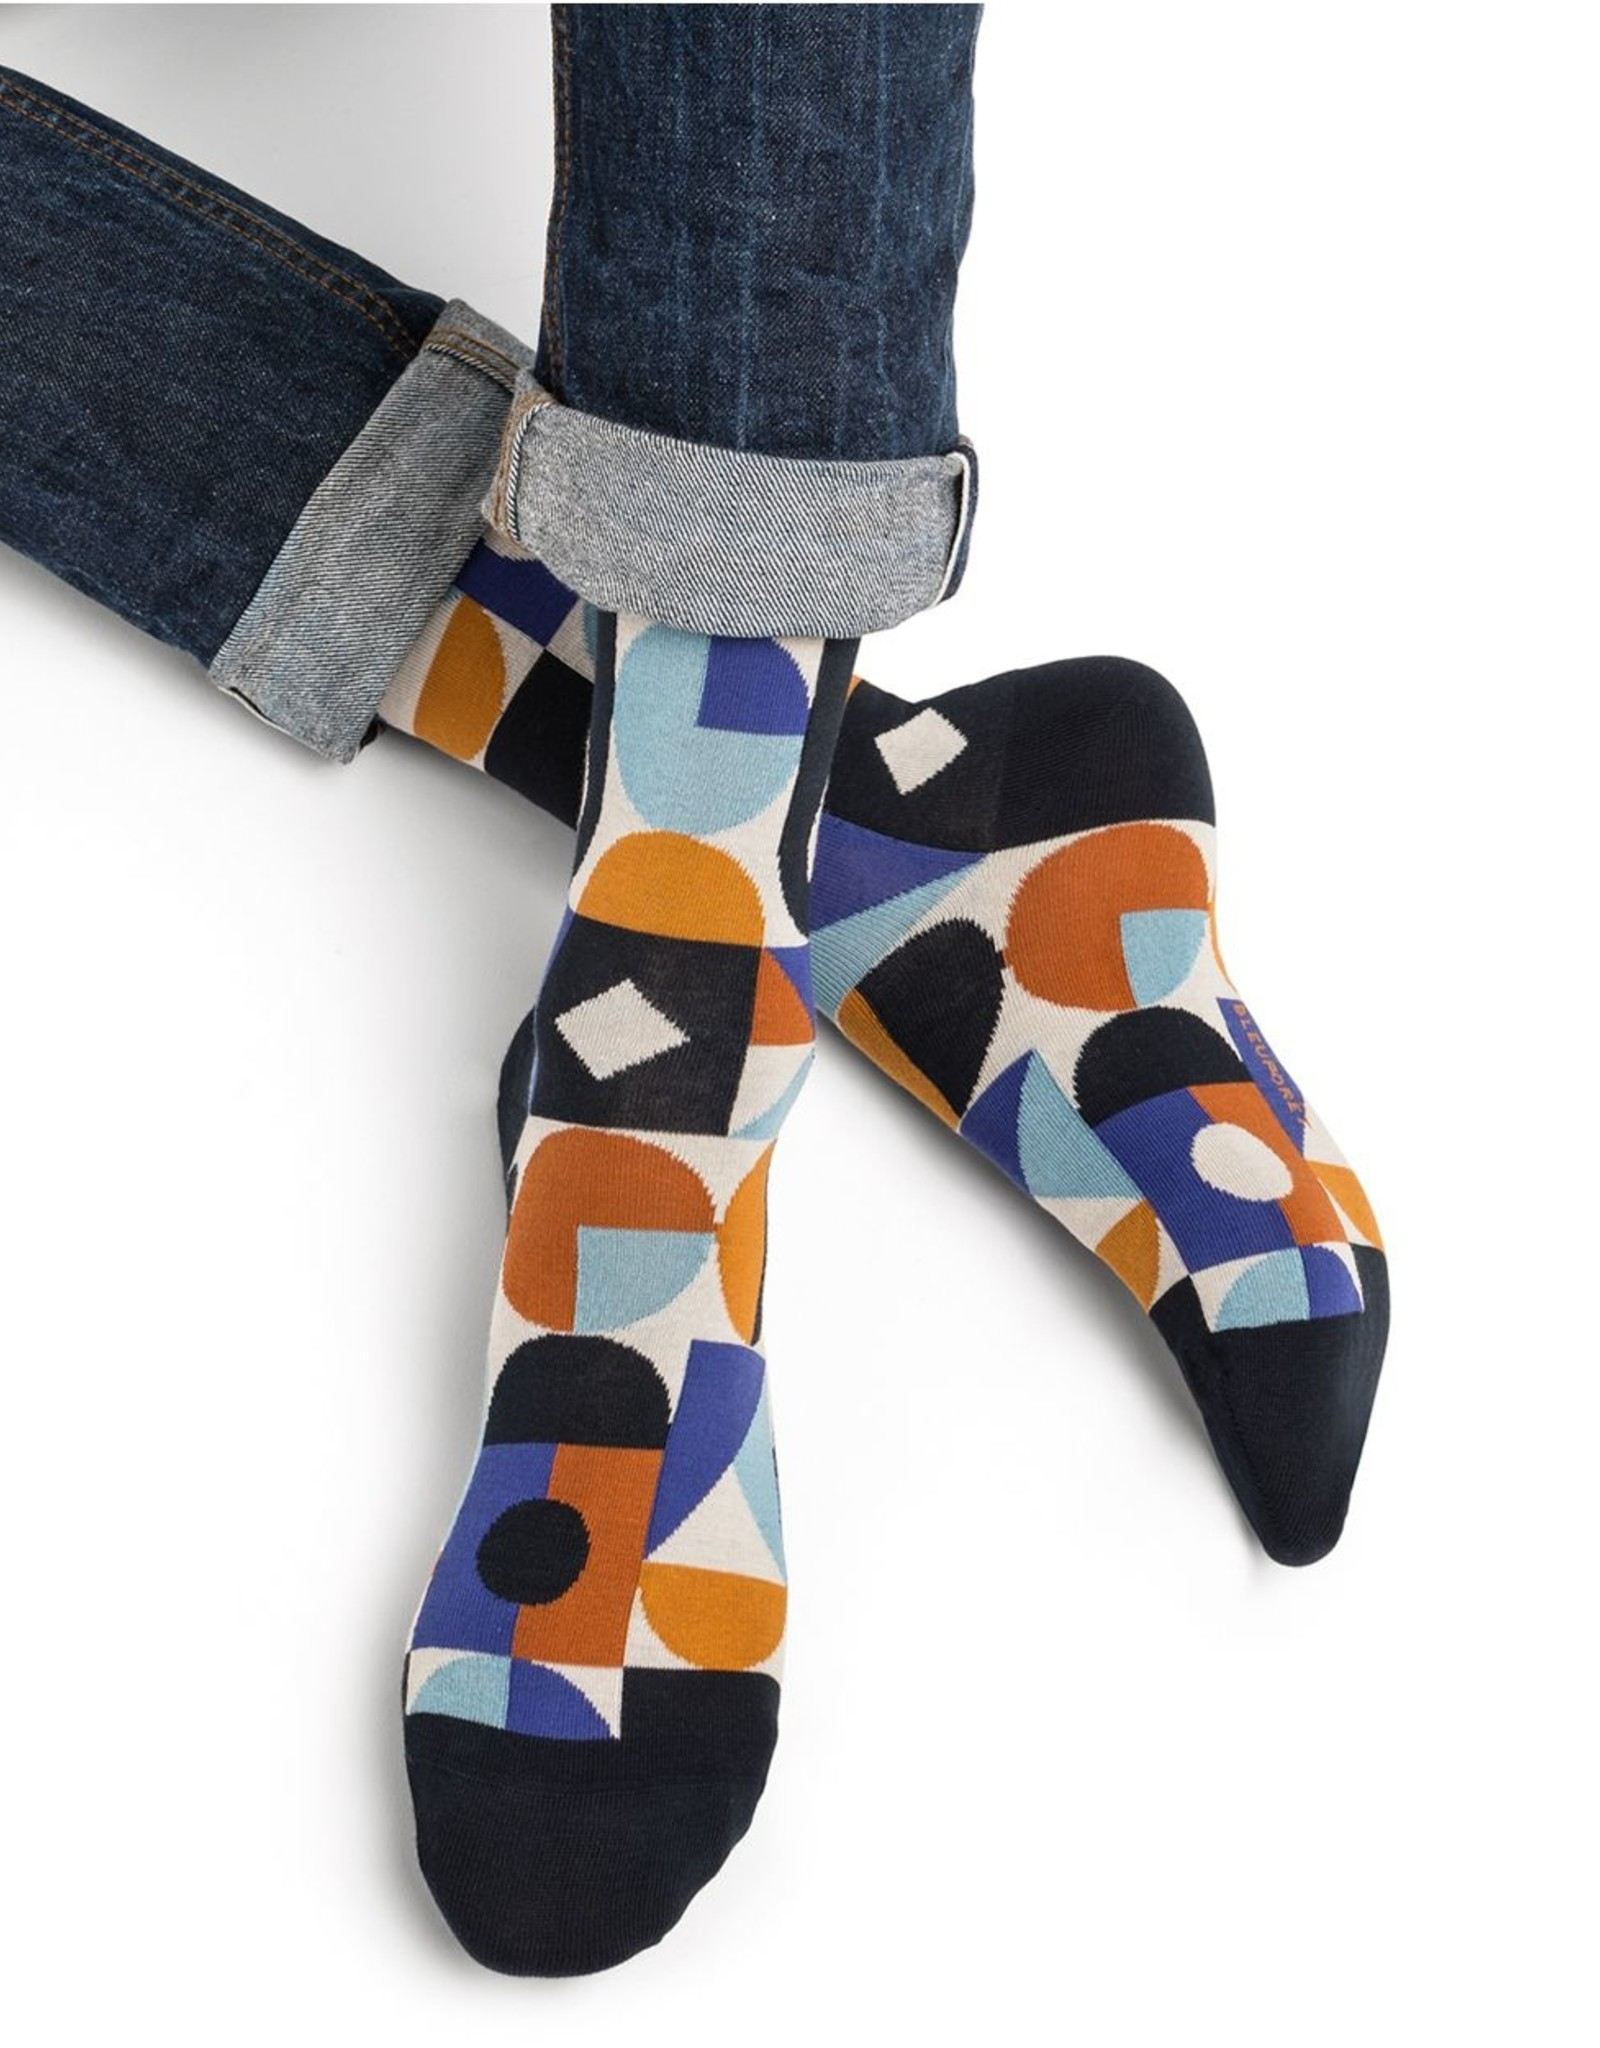 Bleuforet Men's Multi Geometric Pattern Socks